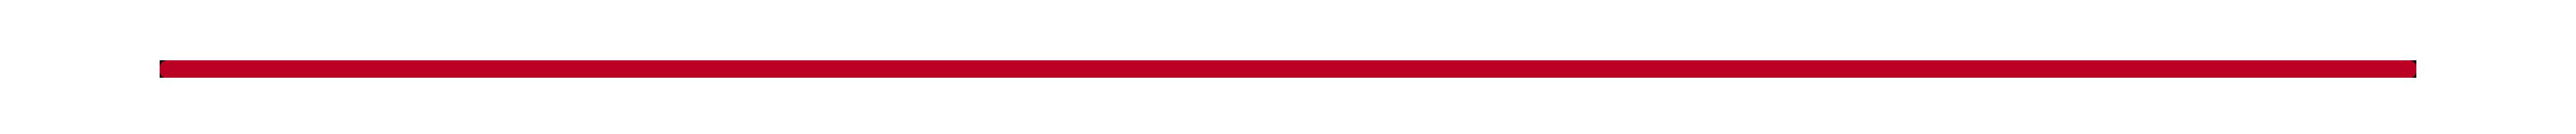 trennlinie-rot.png